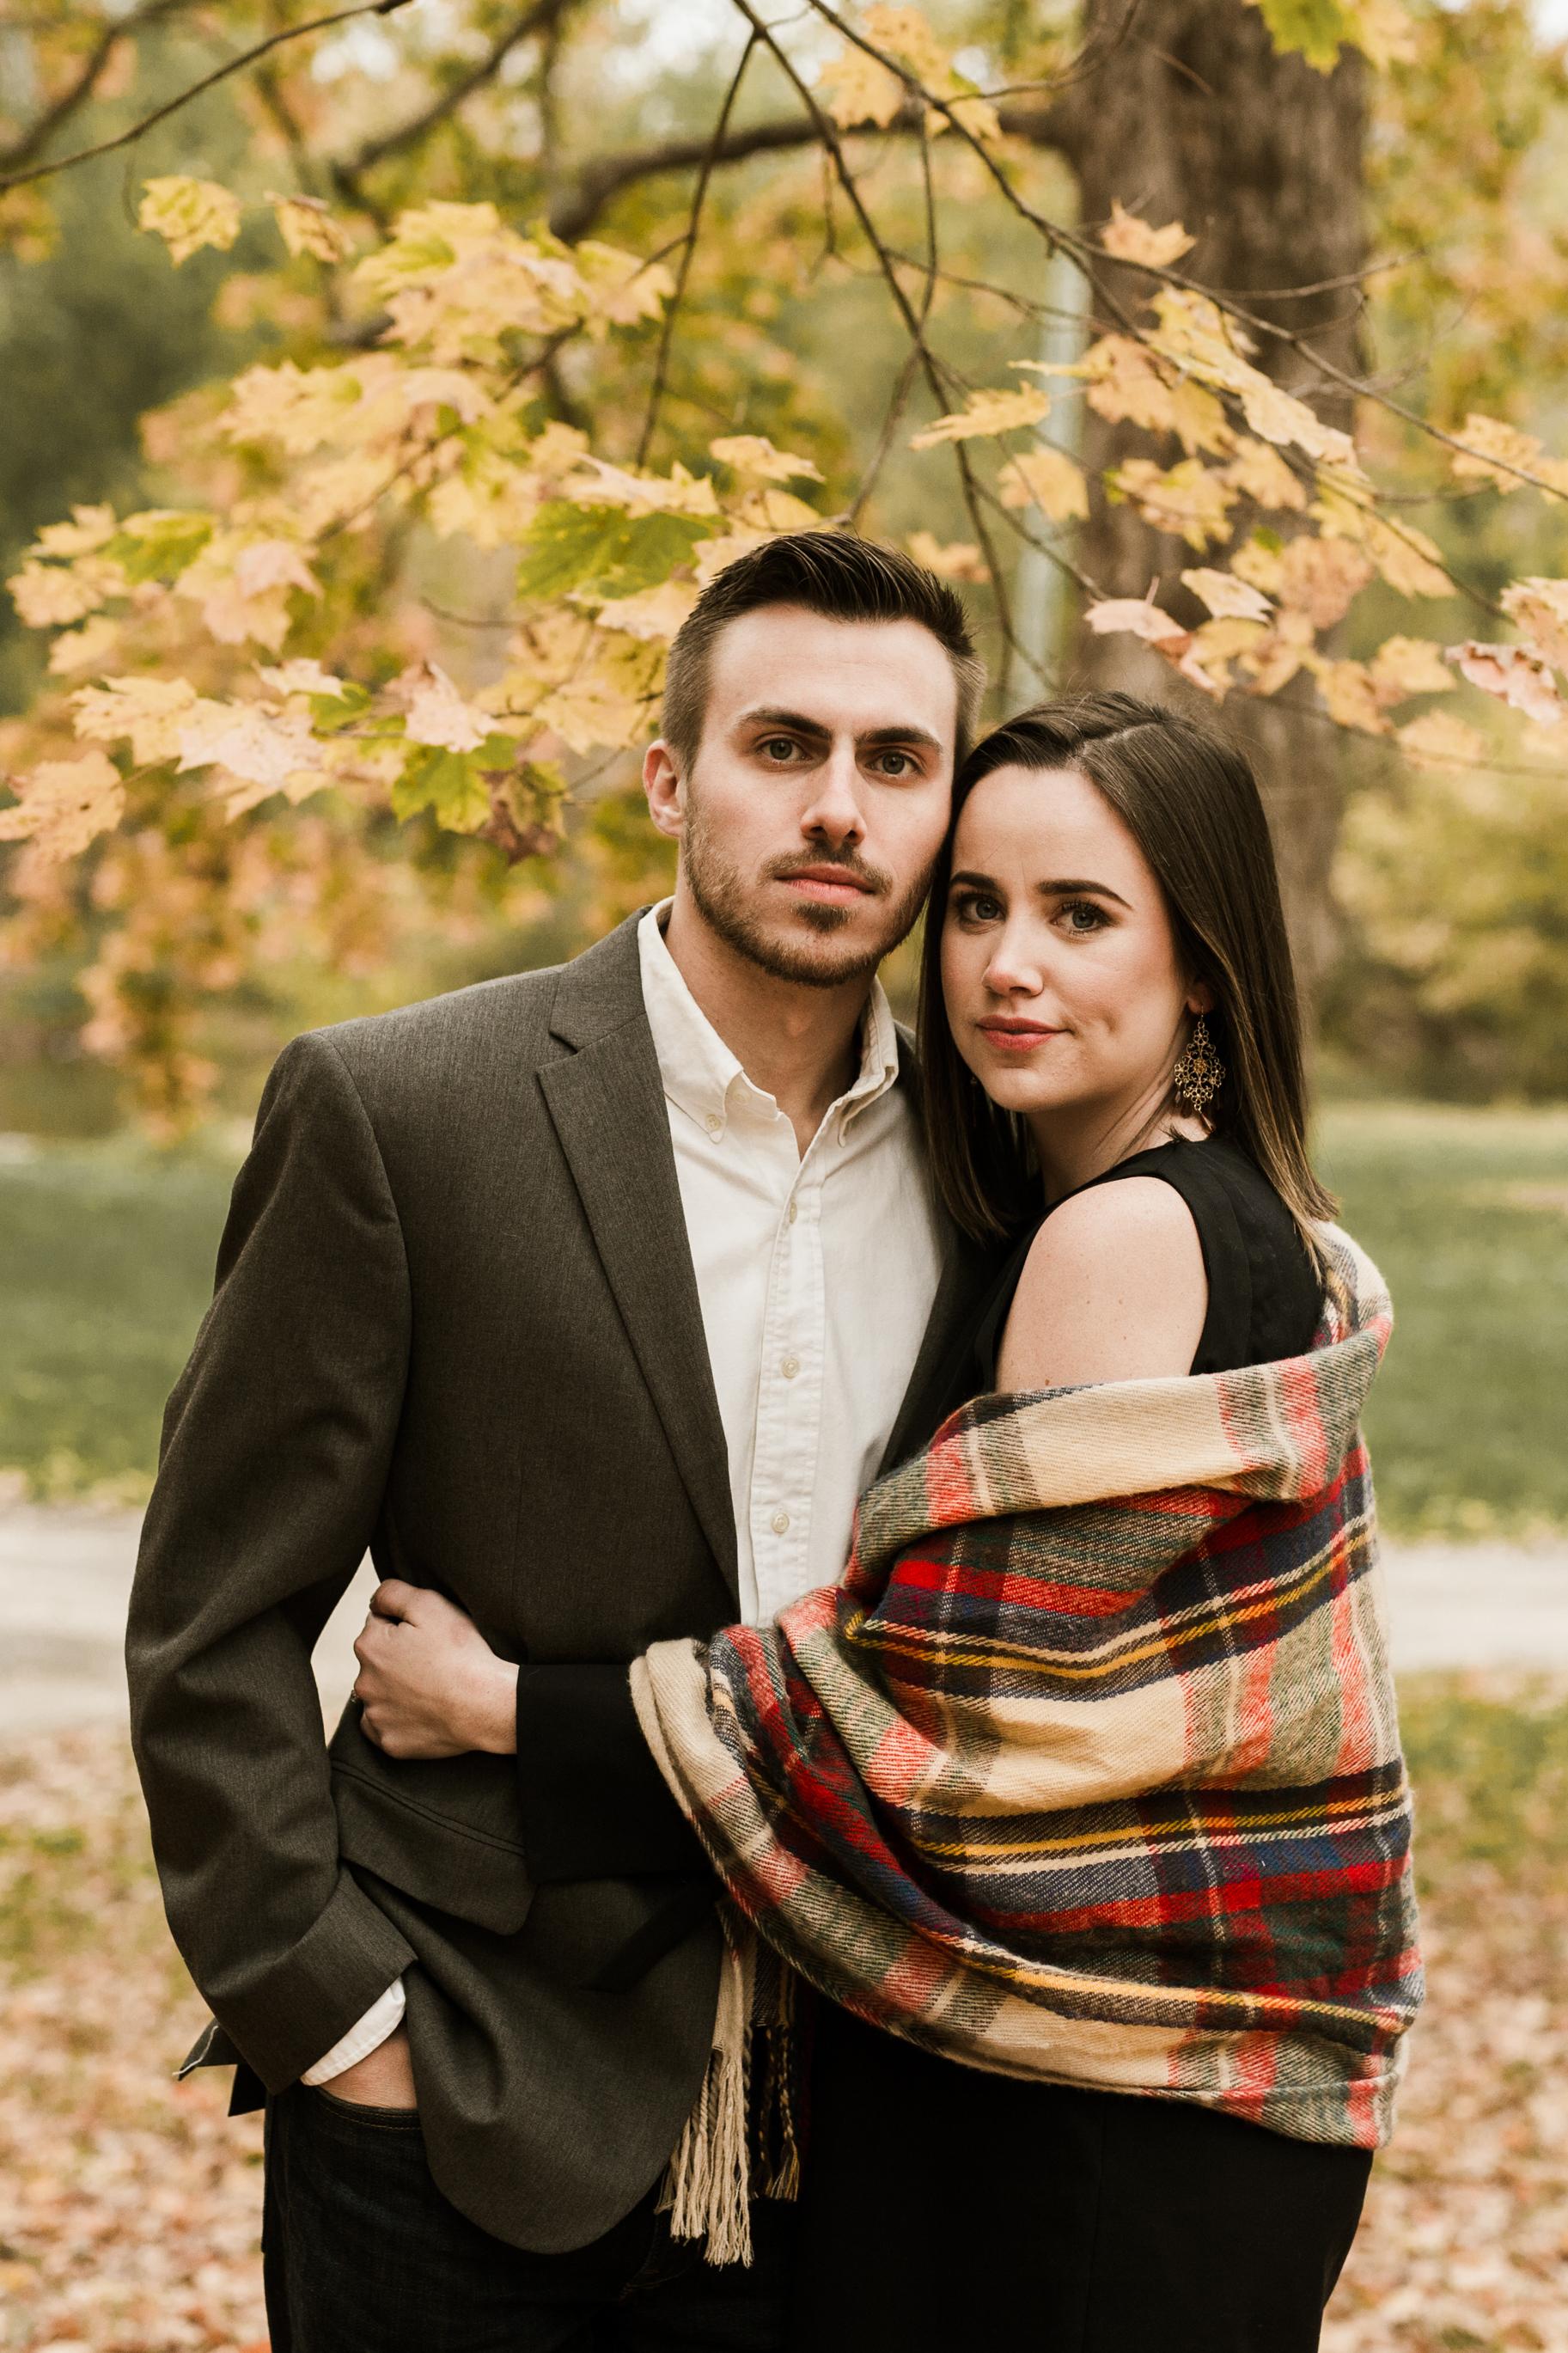 Kelsey and Daniel Engagement 2018 Crystal Ludwick Photo Louisville Wedding Photographer Kentucky Wedding Photographer (13 of 31).jpg